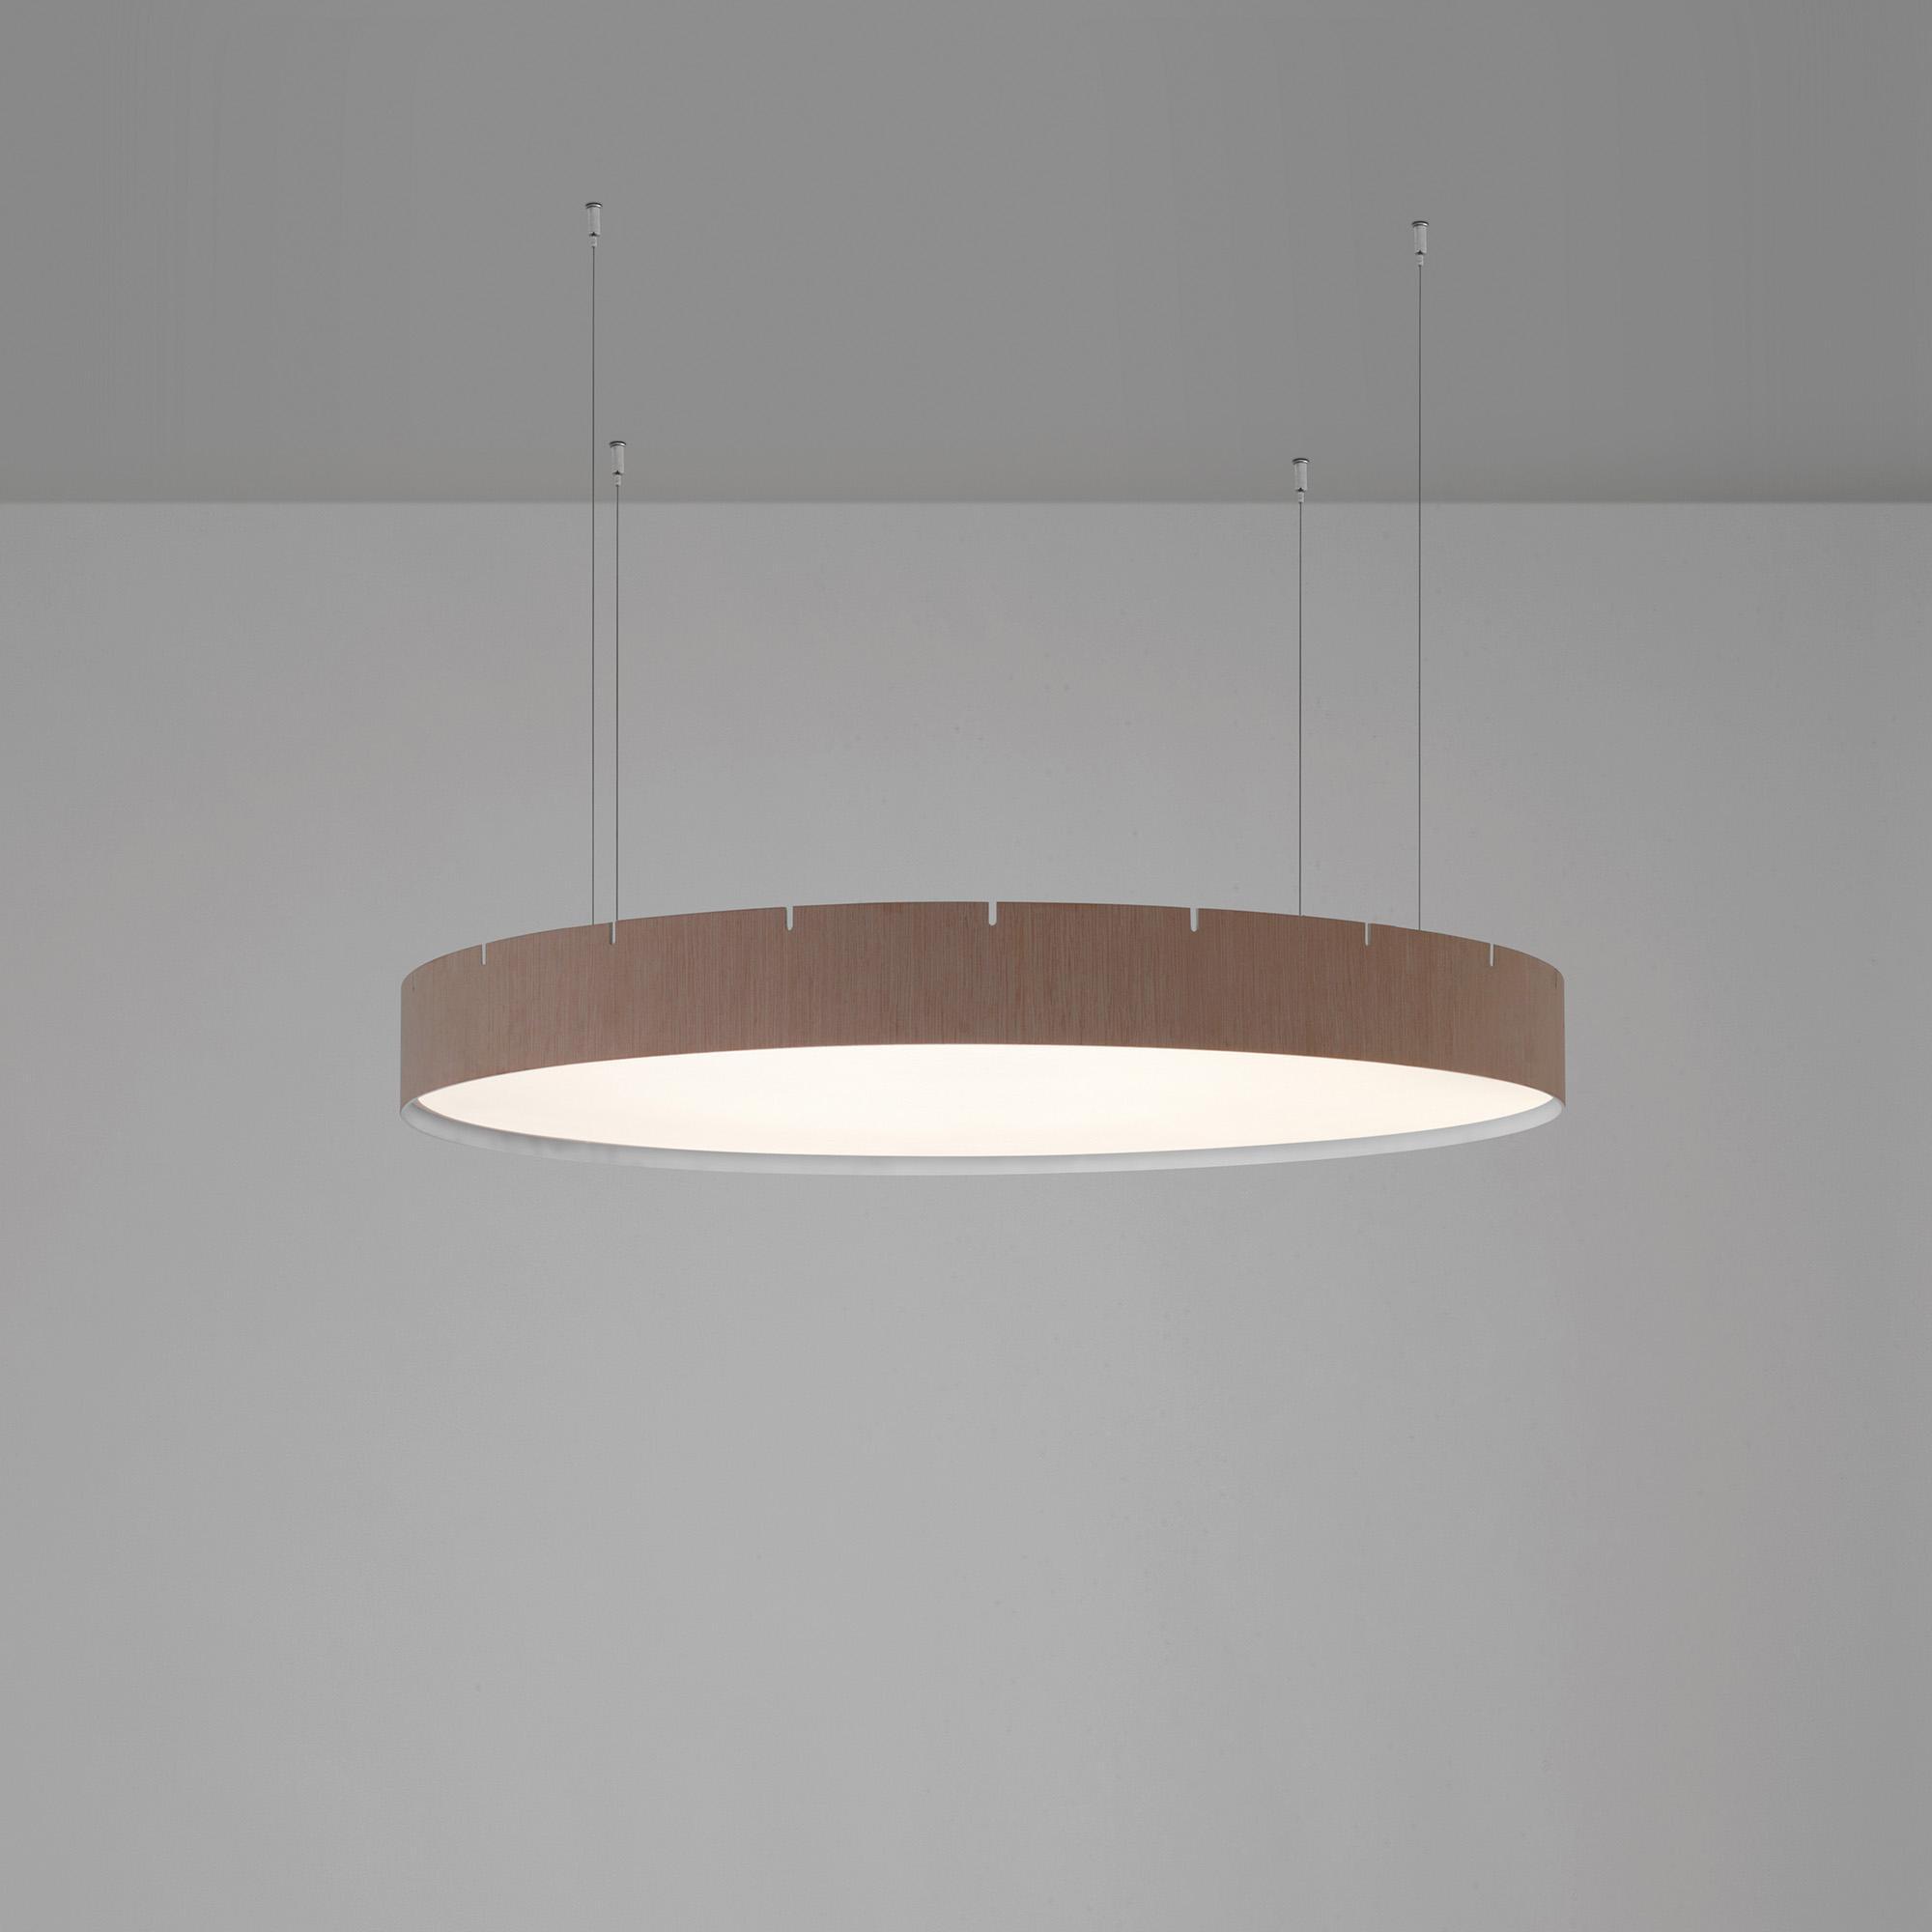 B.LUX - Suspension LED Castle S60 - chêne/naturel/Ø 60cm/3000K - 3416lm - CRI>90